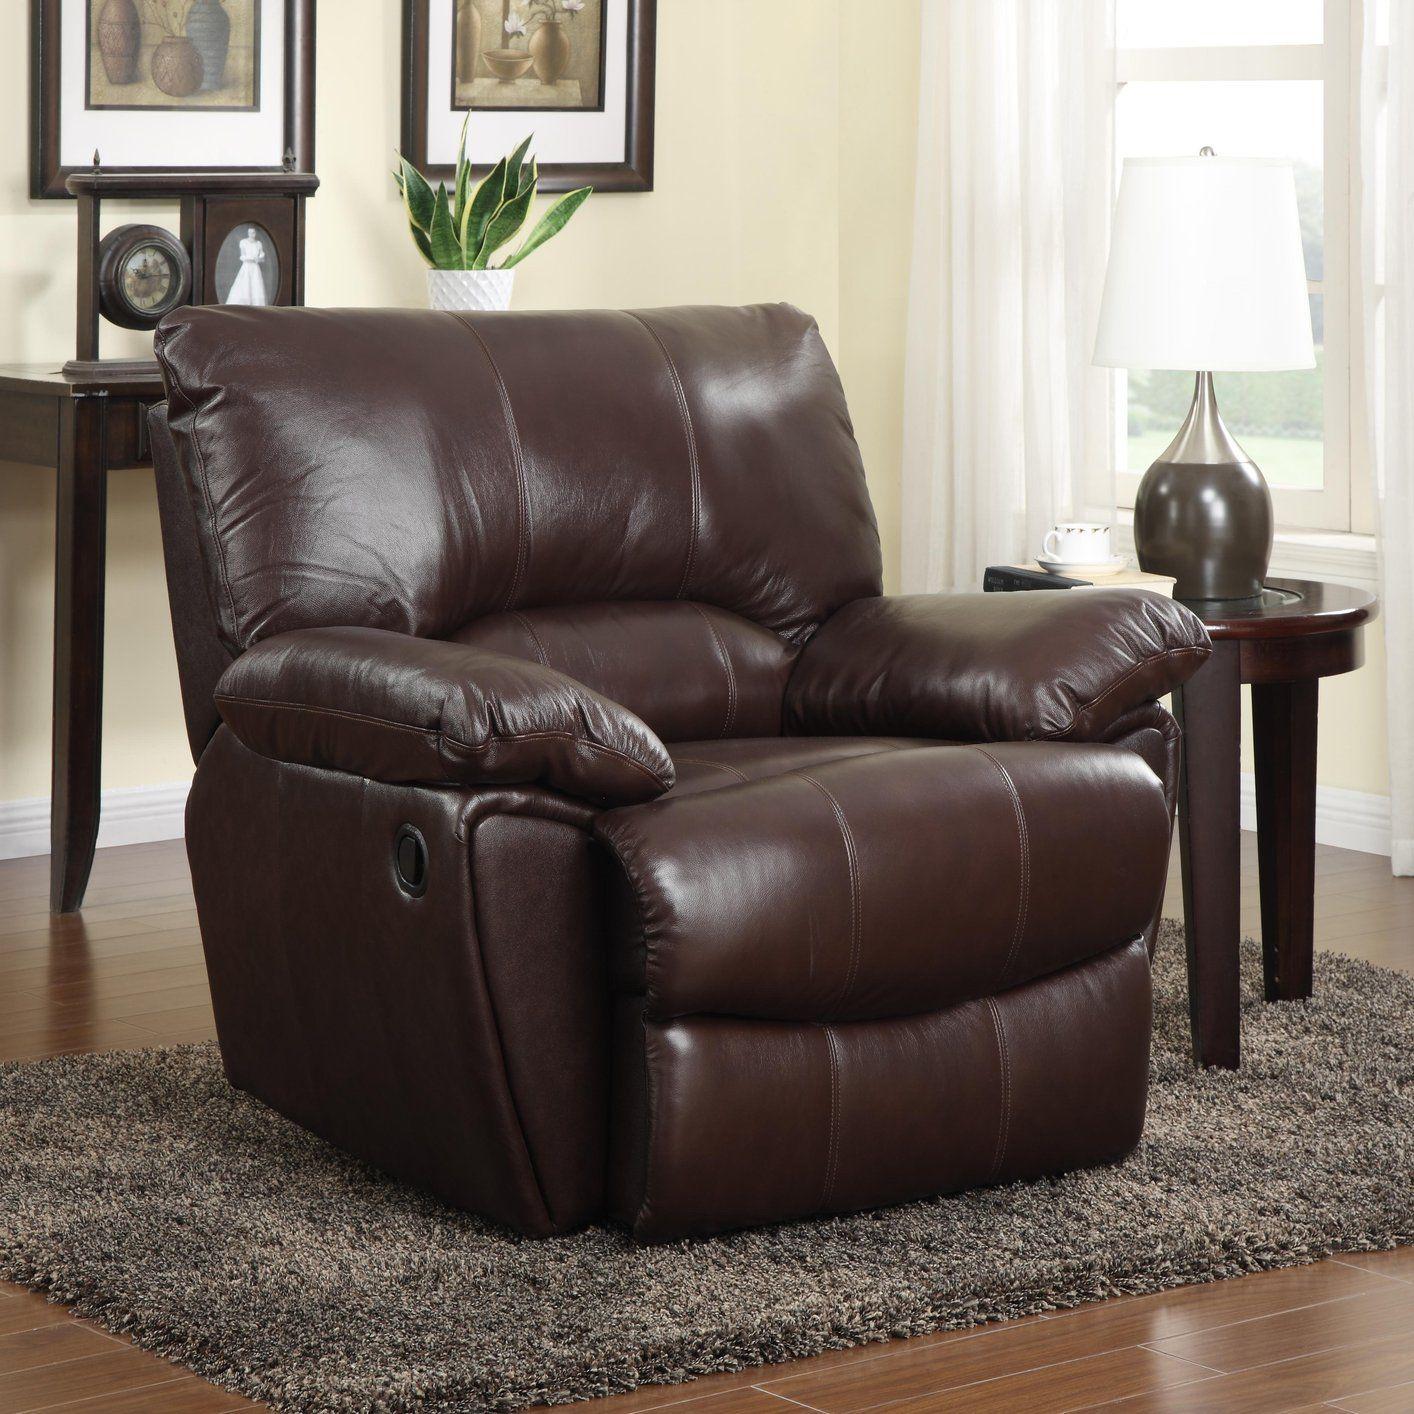 Braun Leder Liege Stuhl - - Brown-Leder-Lehnstuhl : eine charmante